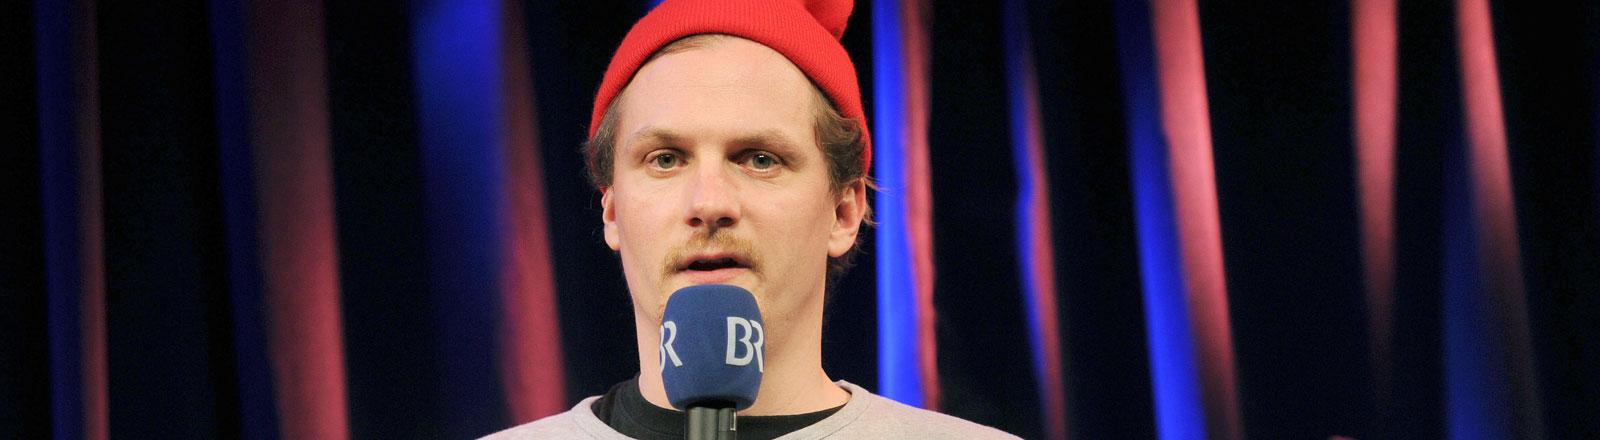 Comedian Vincent Pfäfflin